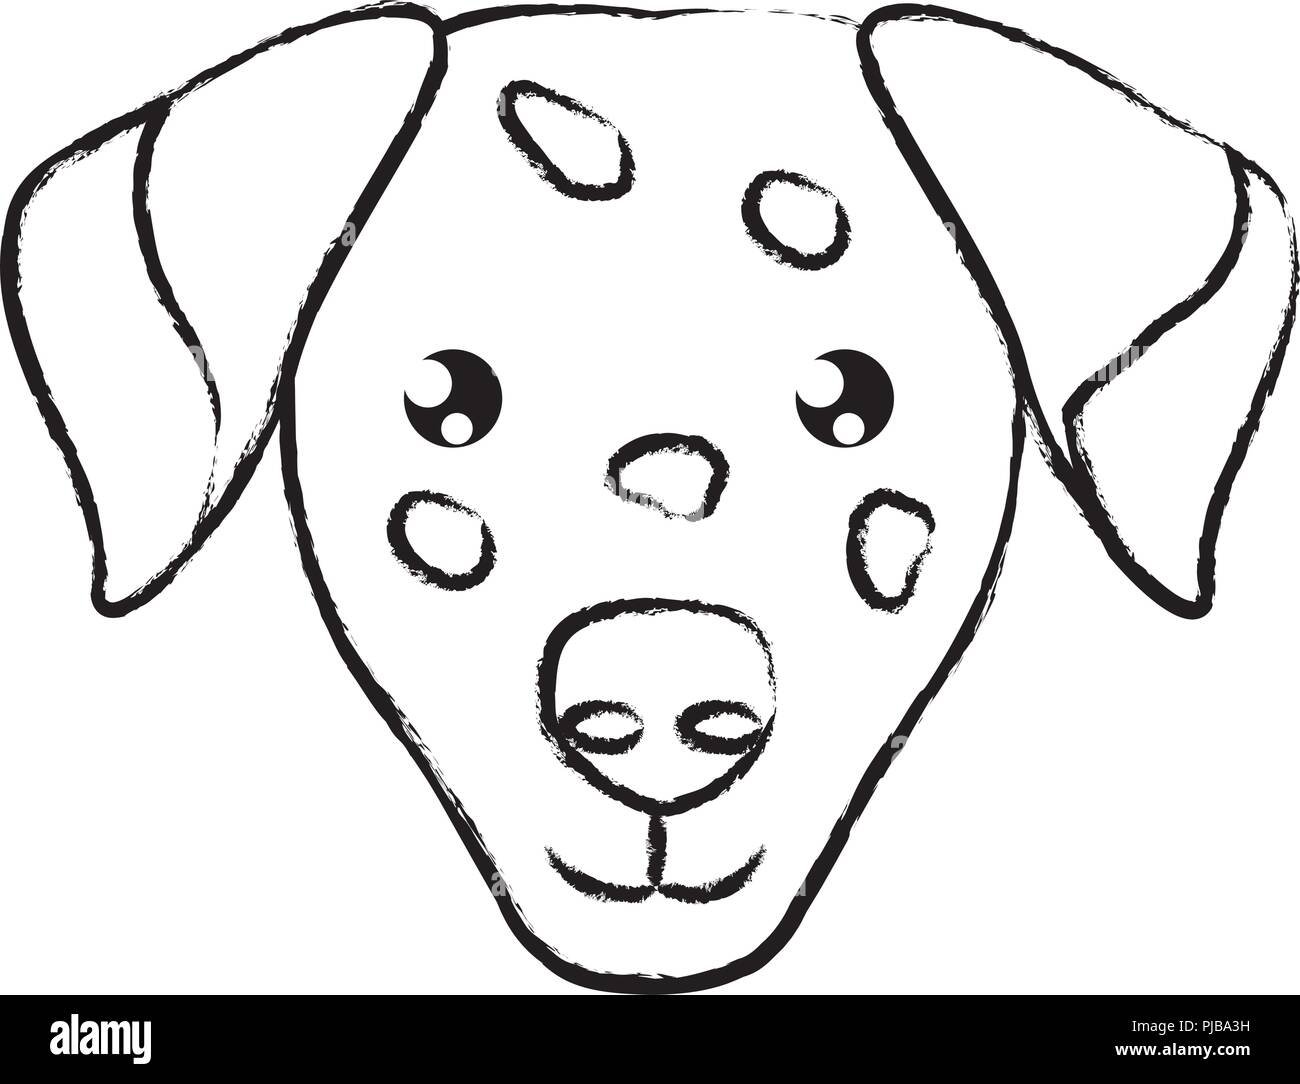 cute dalmatian dog icon over background, vector illustration - Stock Vector